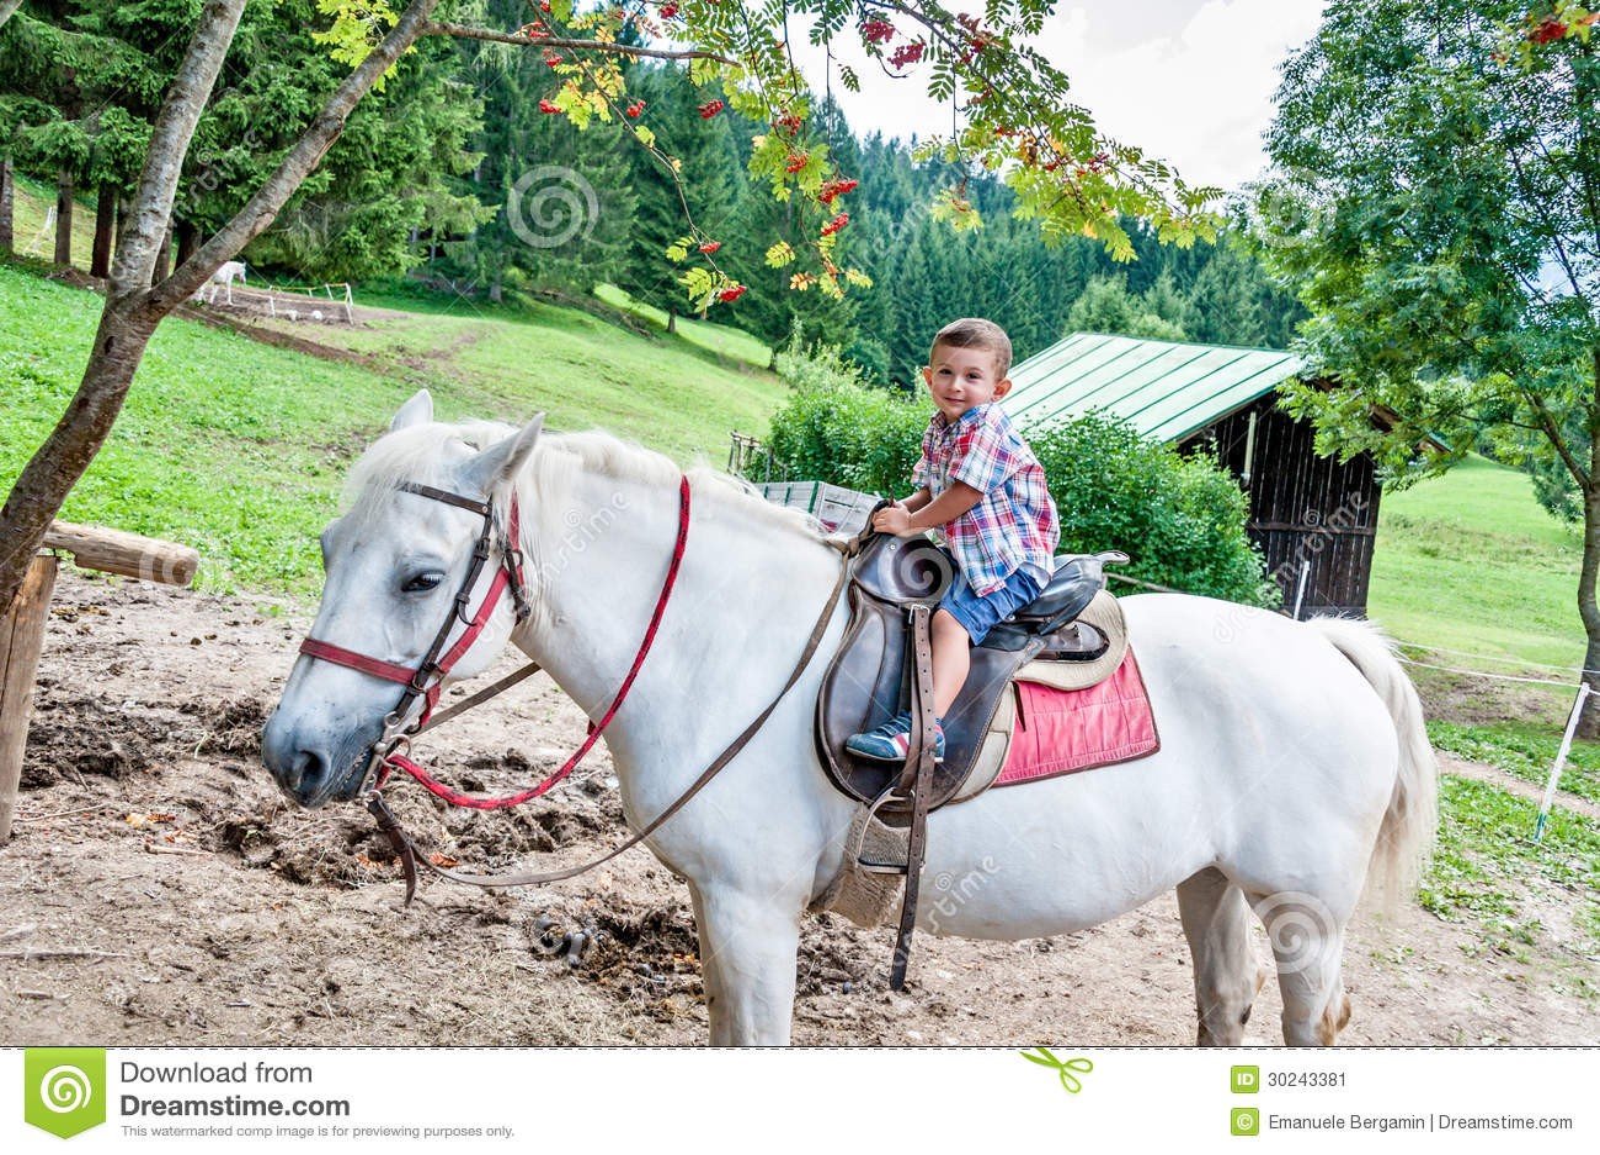 Beautiful Baby Rides A Horse Stock Image Image Of Horizontal Preschool 30243381